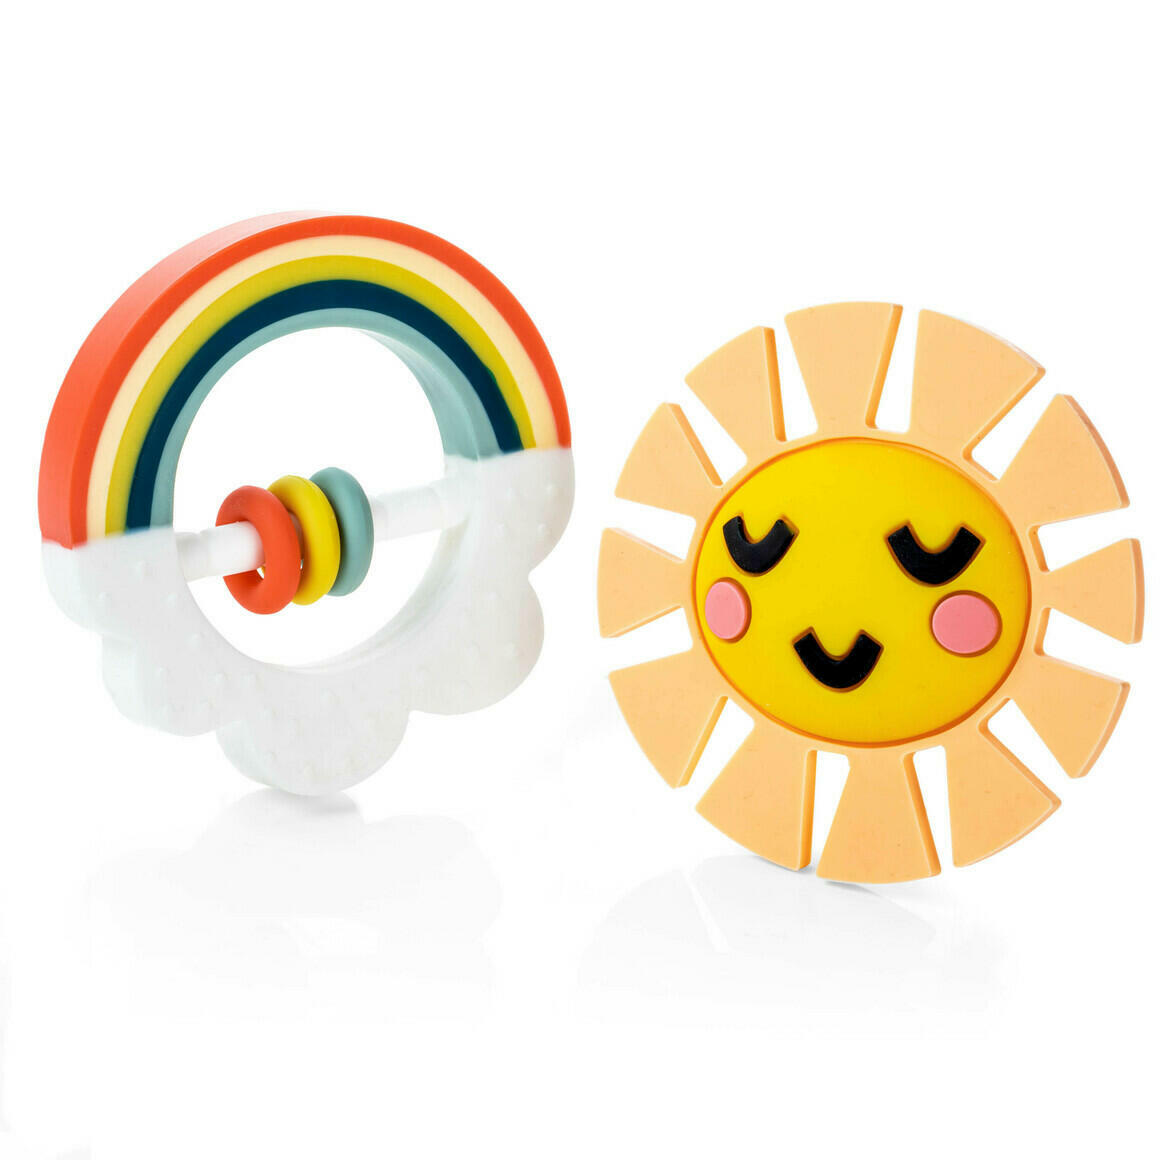 Little Rainbow Teether Toy | Trada Marketplace